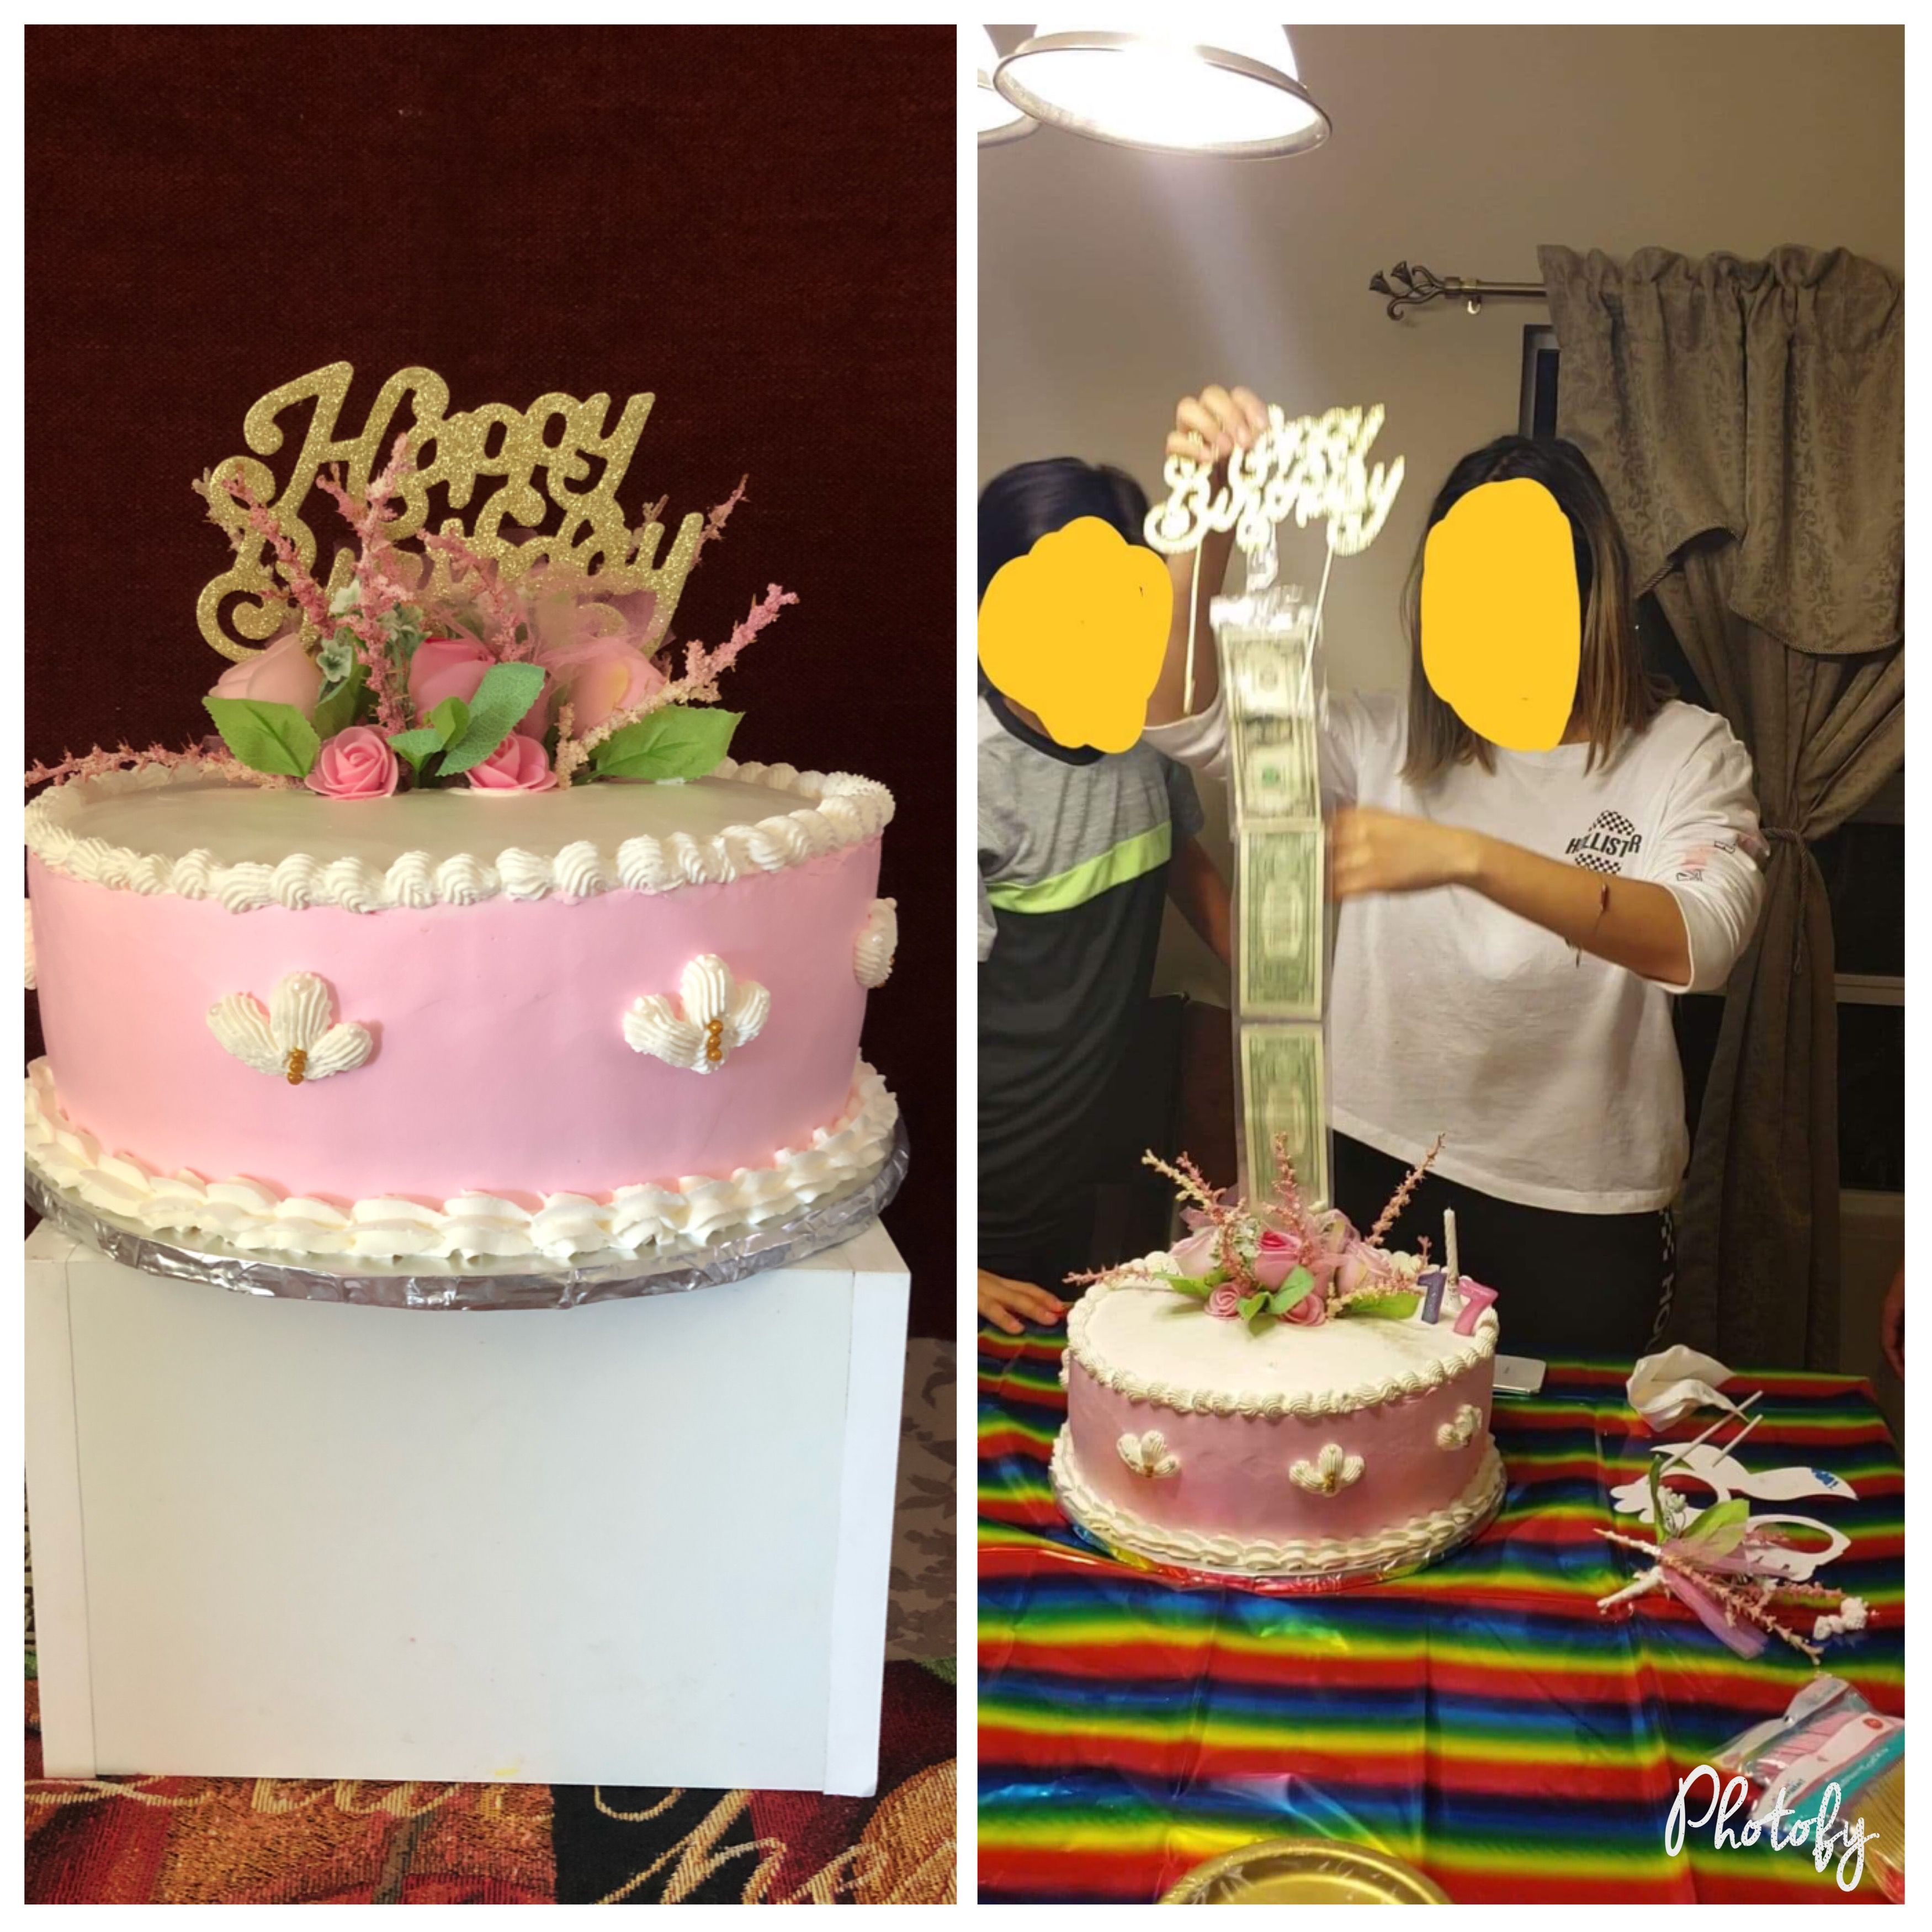 Cake with money inside queremos pastel pasteles